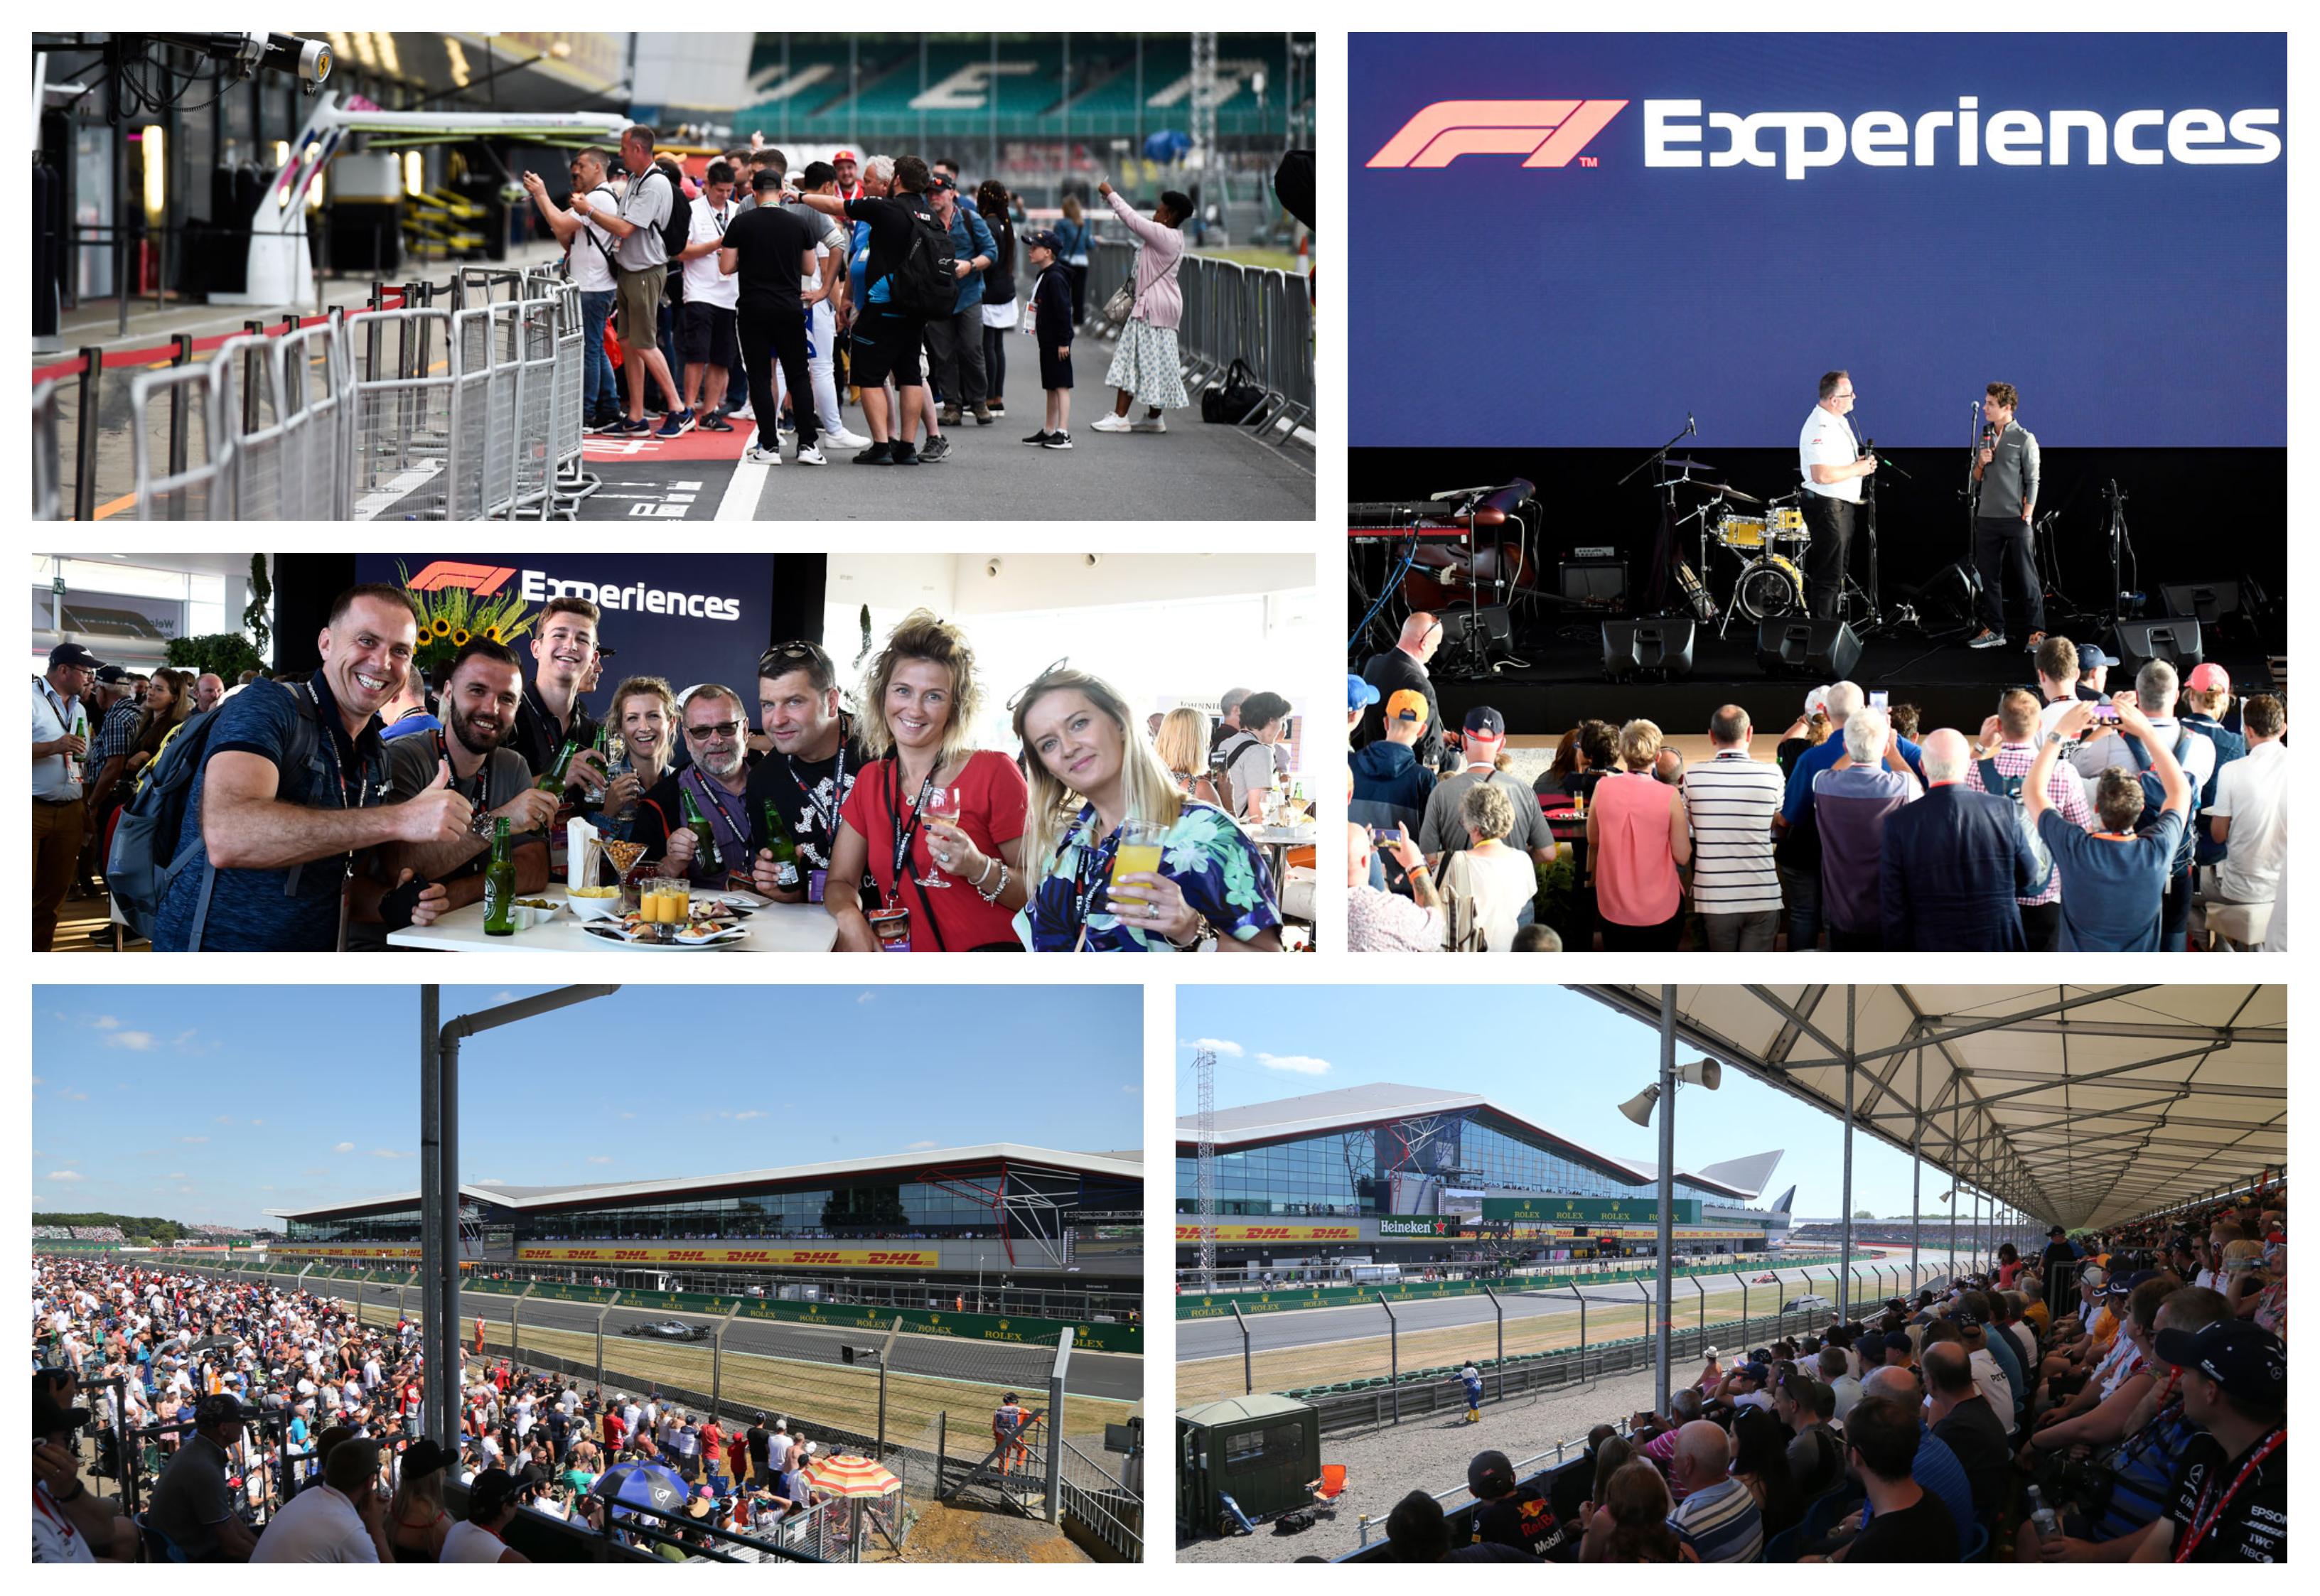 Grand Prix Engeland – Formule 1 Silverstone 2021 – Hero ticketpakket F1® Experiences